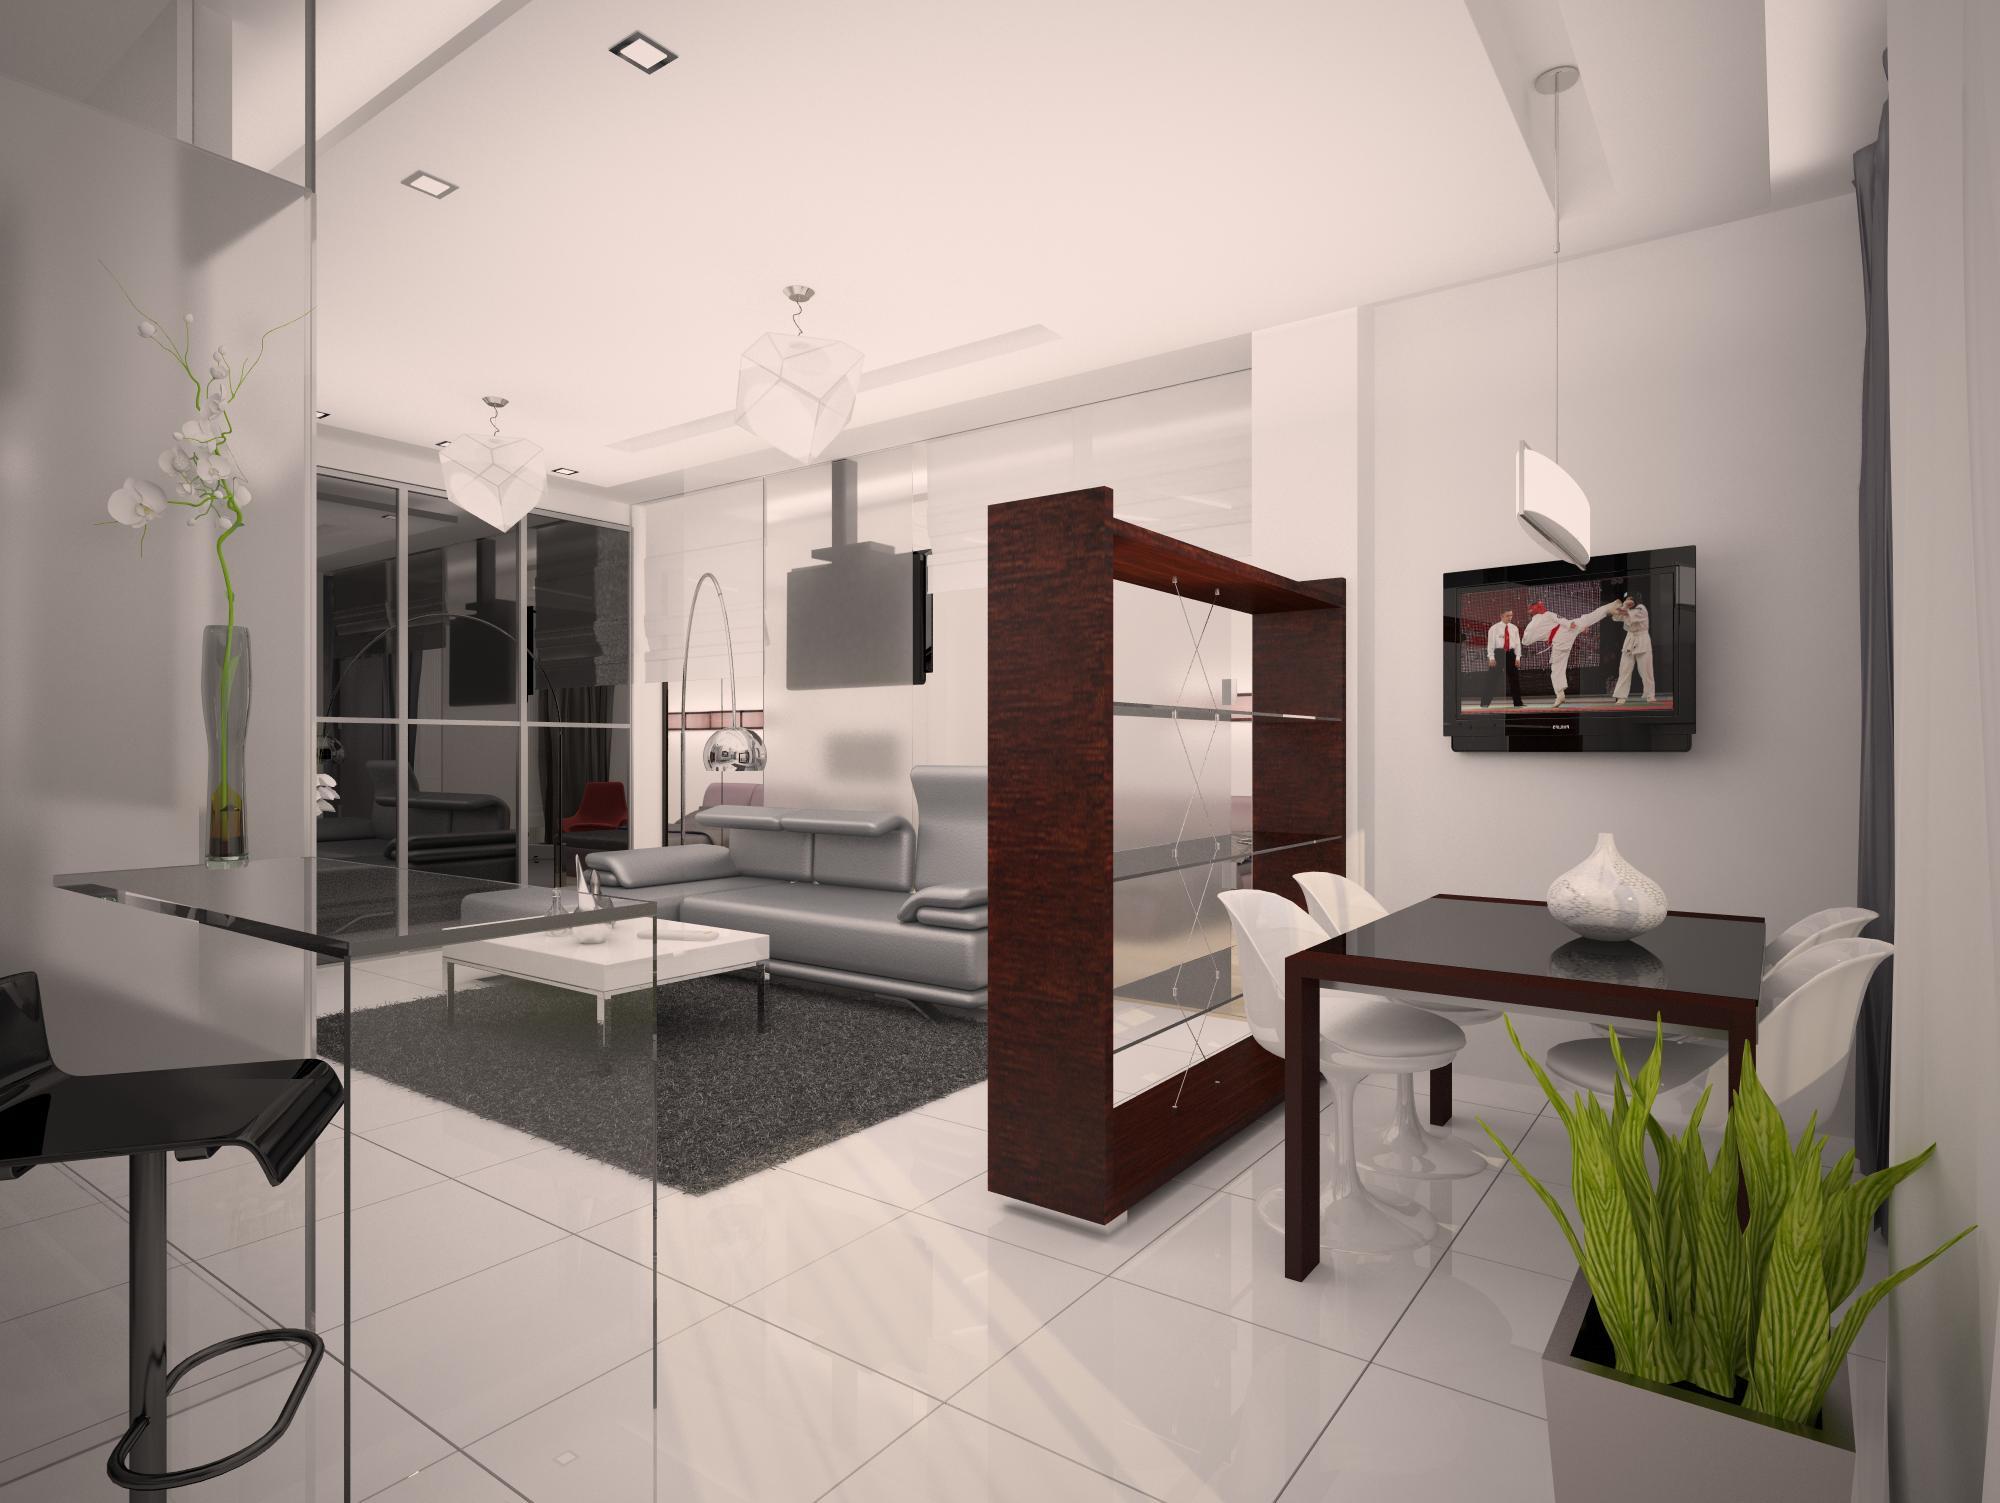 Ремонт однокомнатной квартиры фото идеи варианты